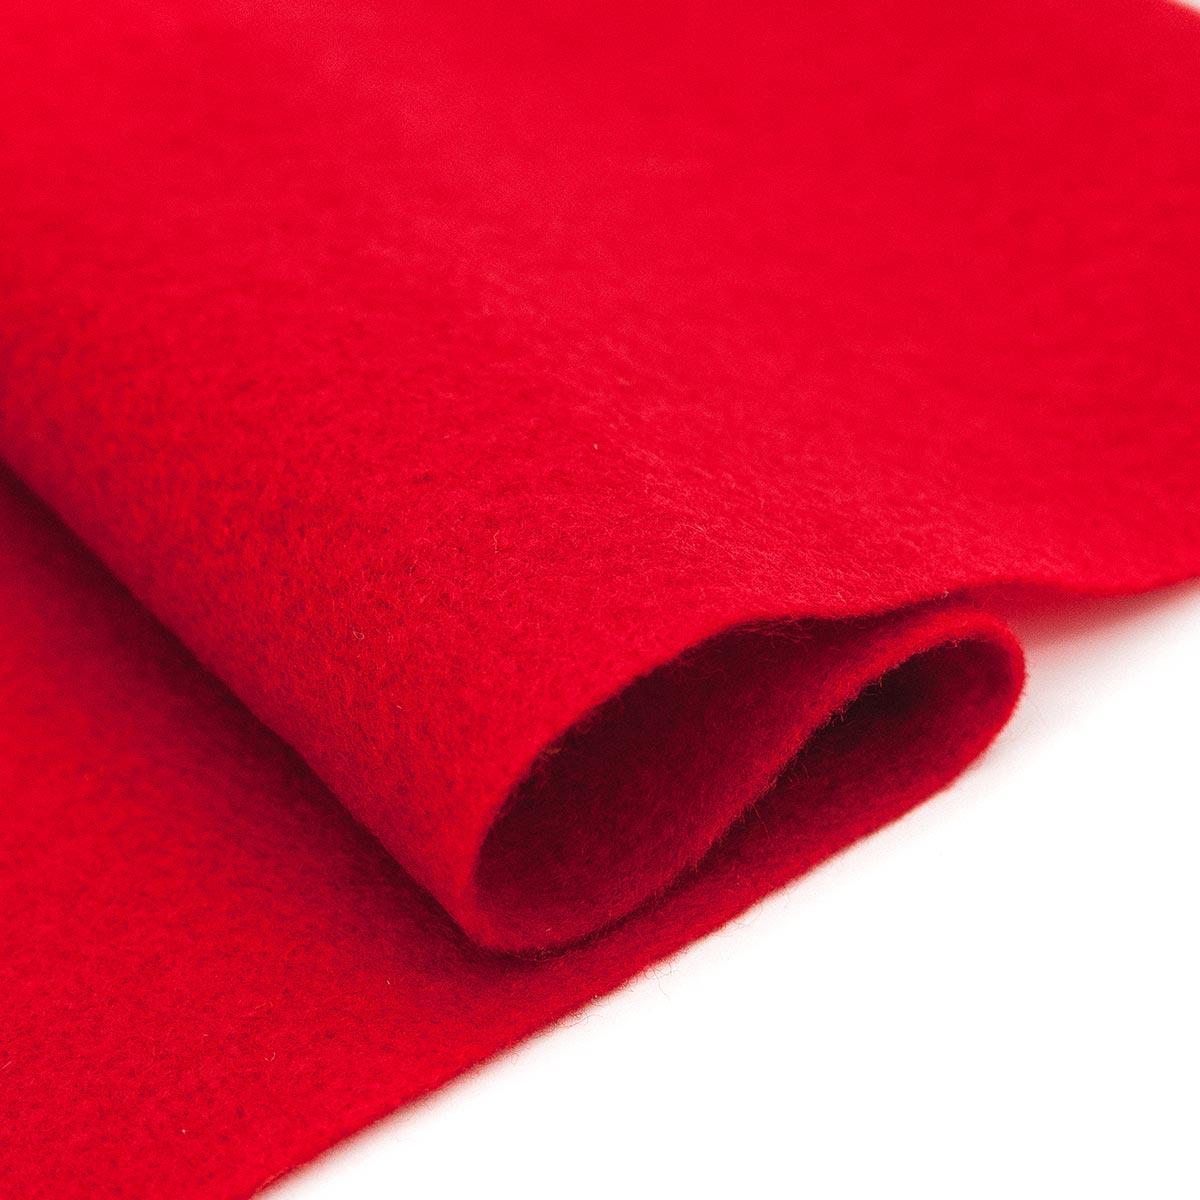 61212665 Фетр для творчества, темно-красный, 2мм, 20x30см, уп./1шт. Glorex